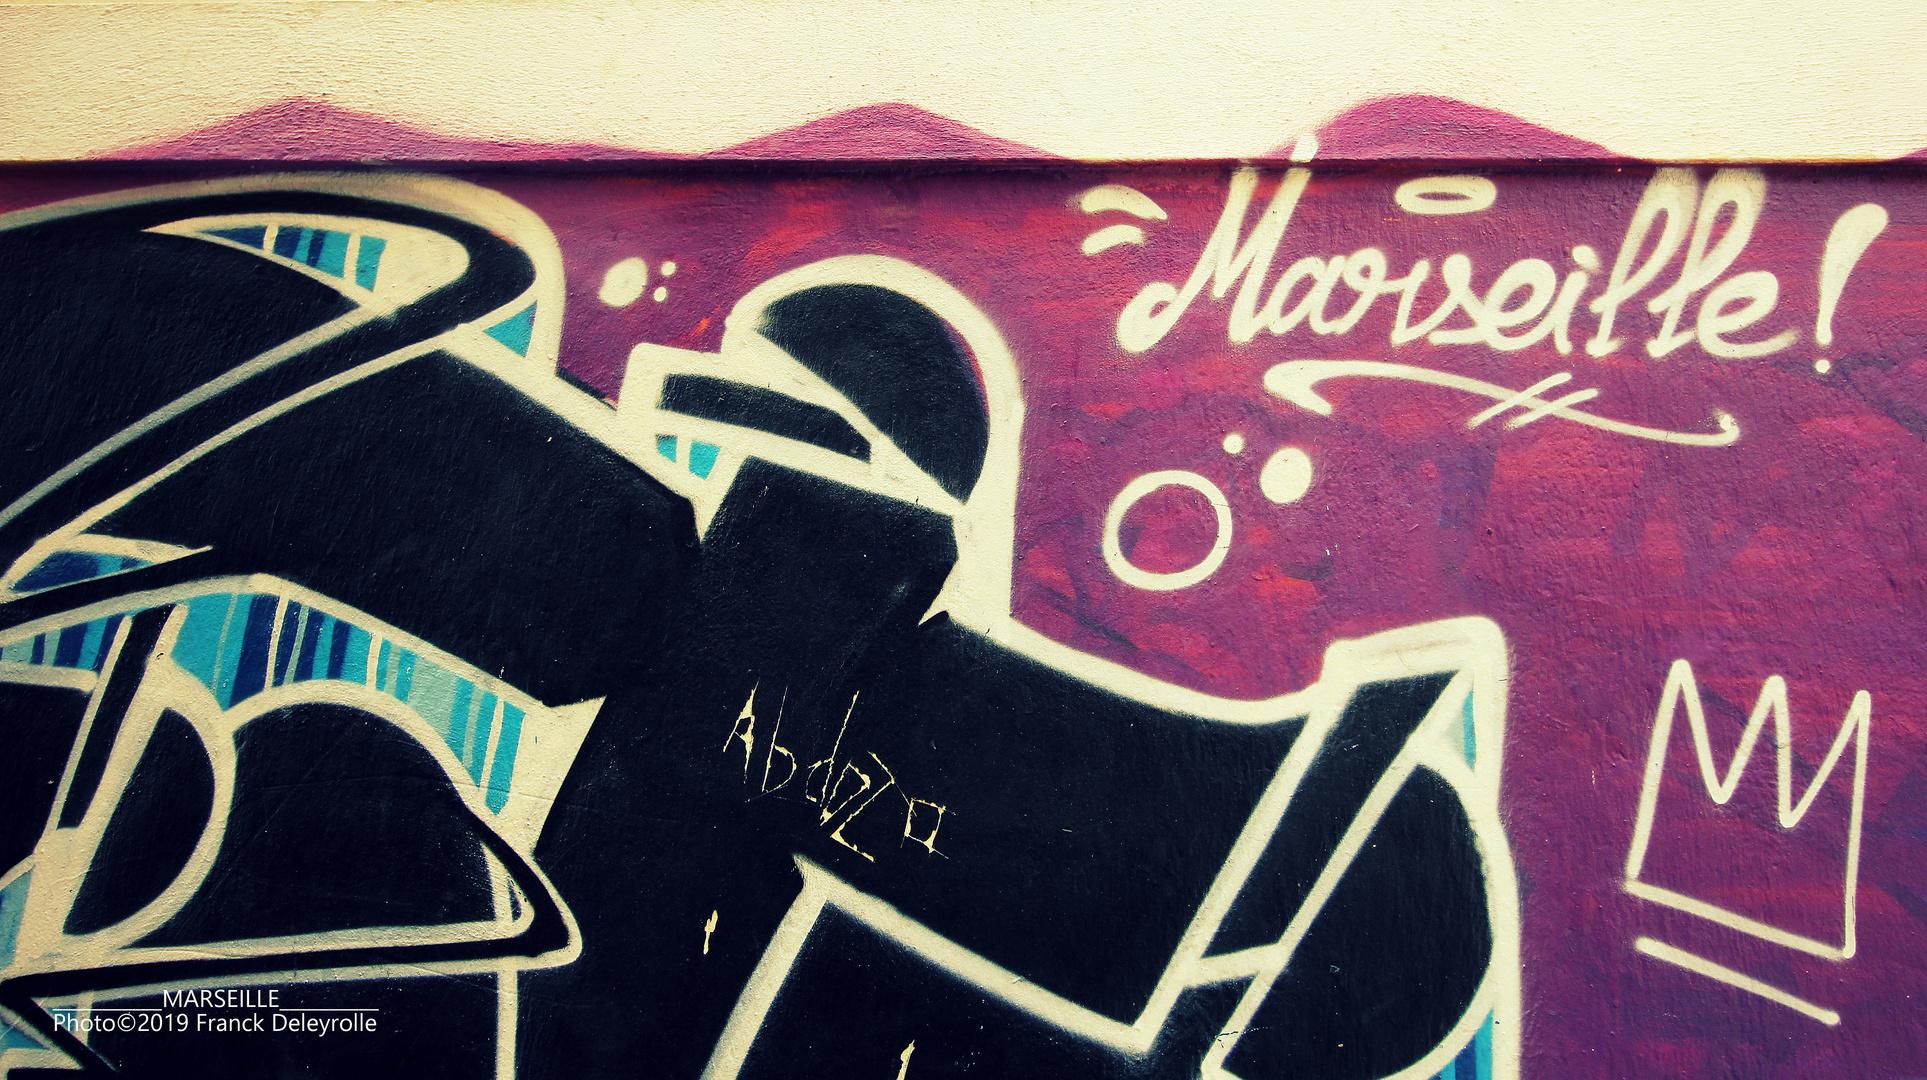 Marseille / Art urbain